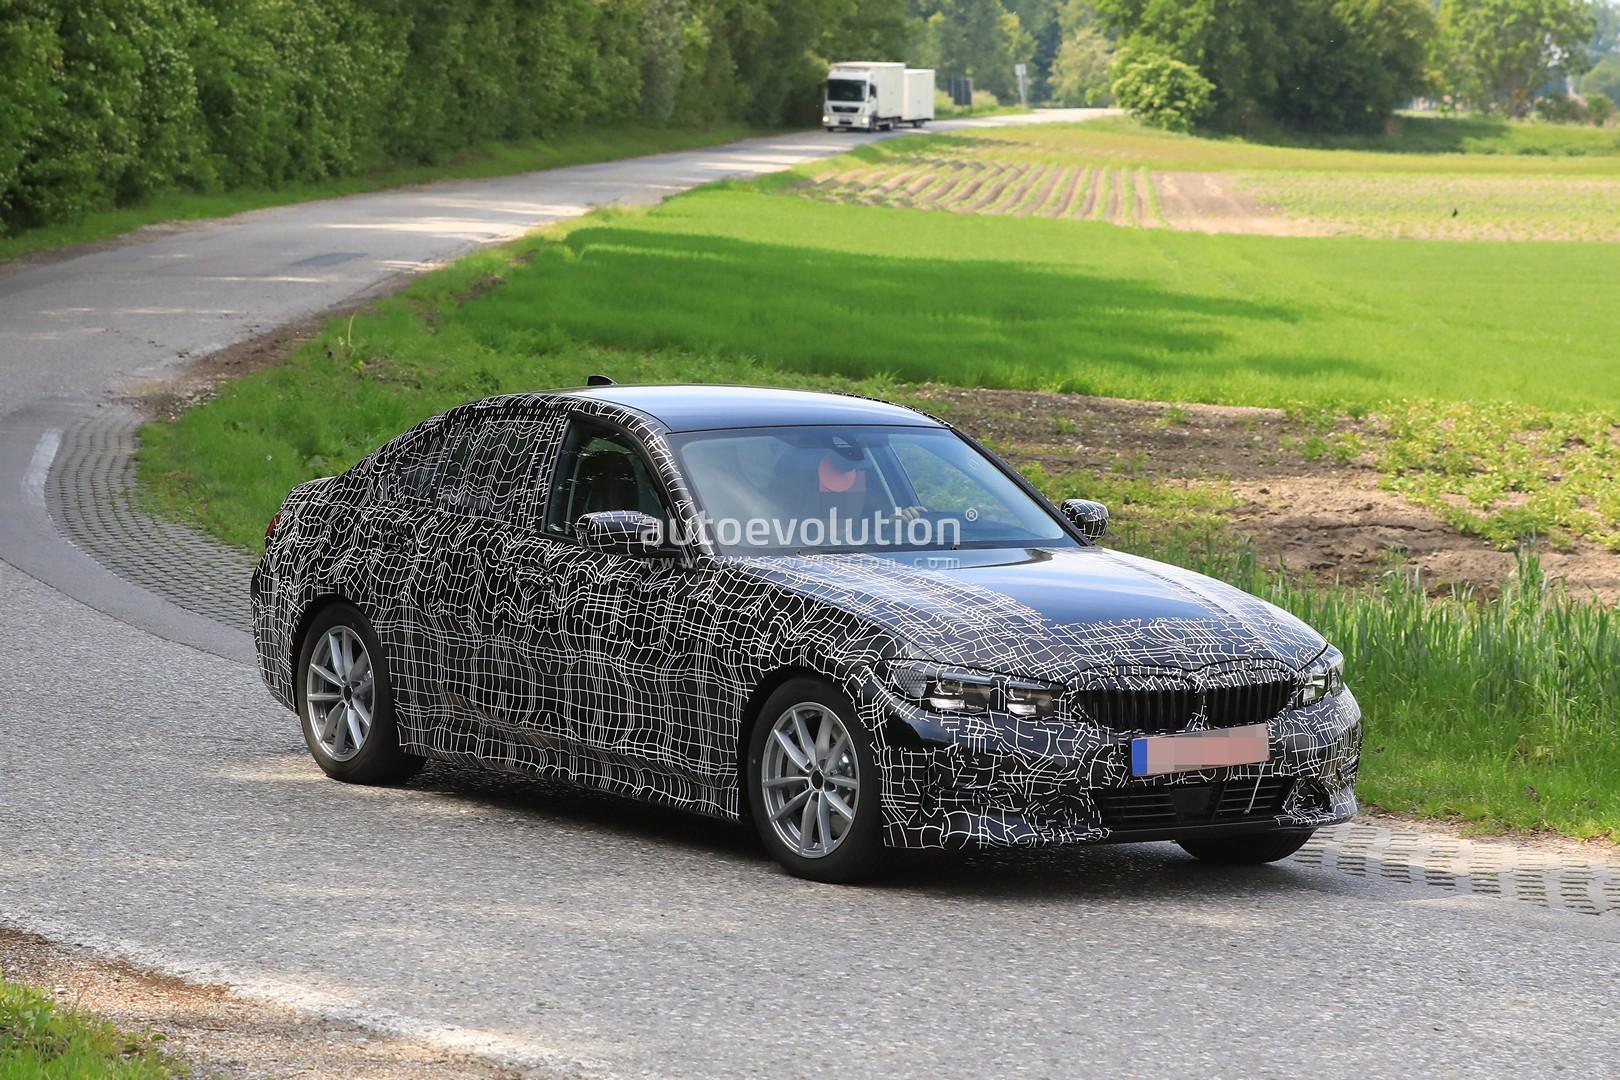 Bmw 3 Series G20 >> Spyshots: 2019 BMW 3 Series Sheds Heavy Camo, Reveals 8 Series-Like Design - autoevolution